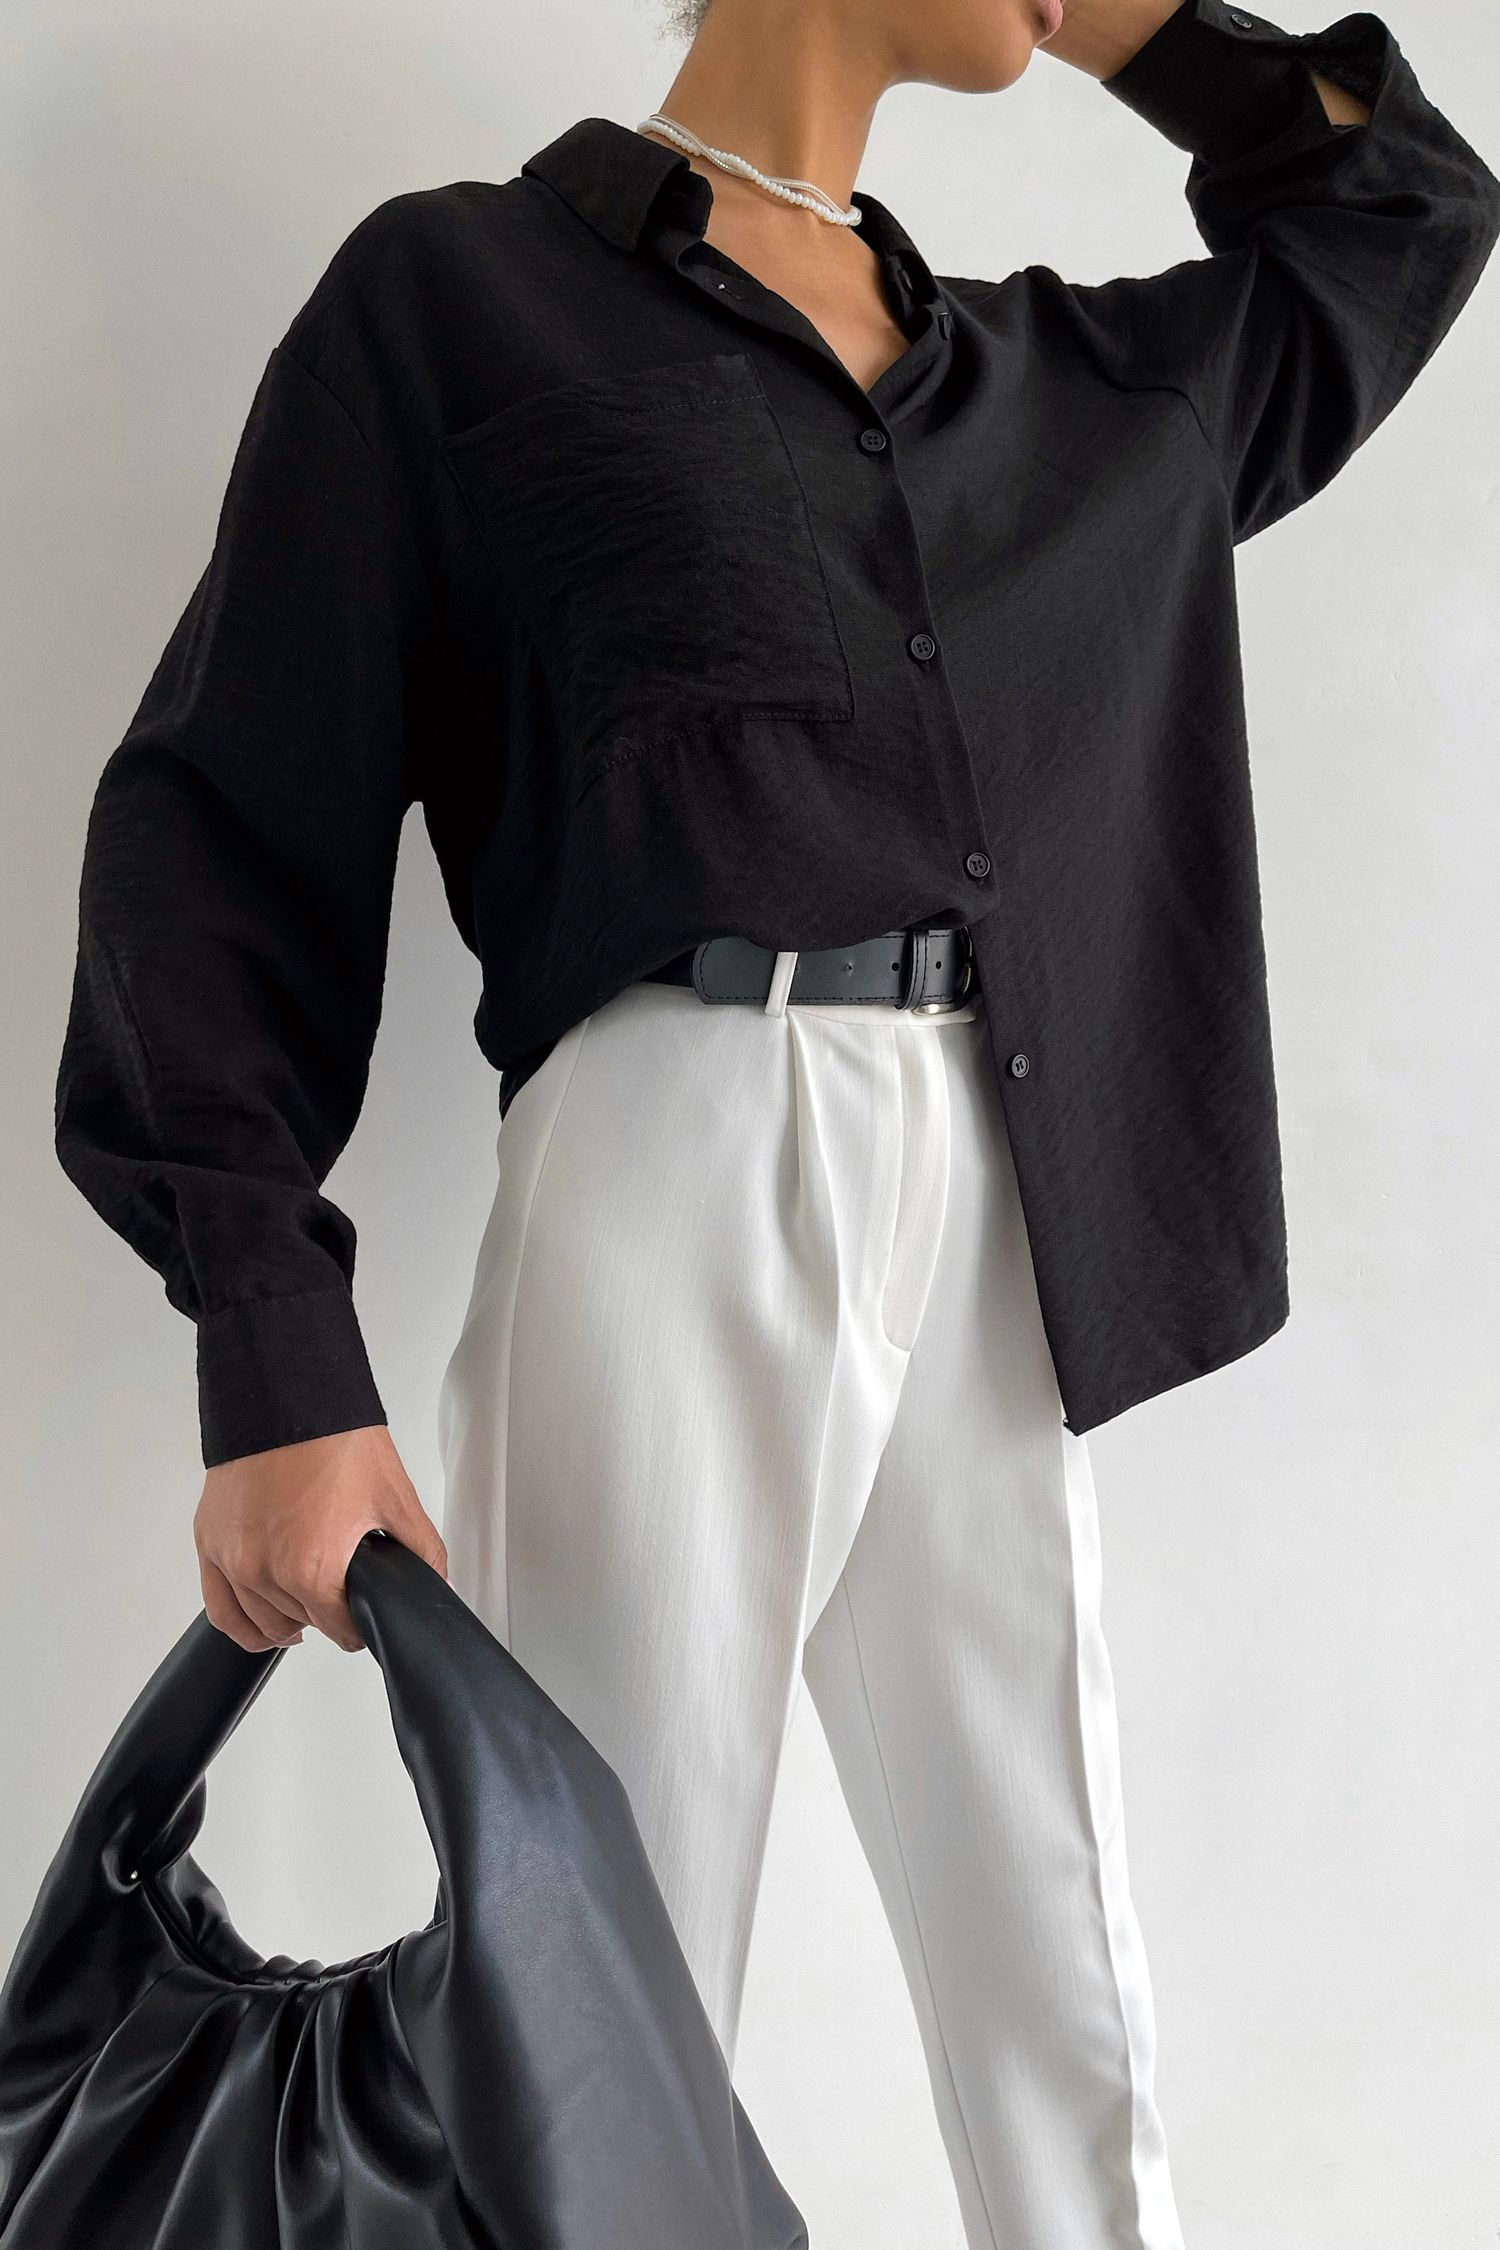 Рубашка с накладным карманом черная - THE LACE